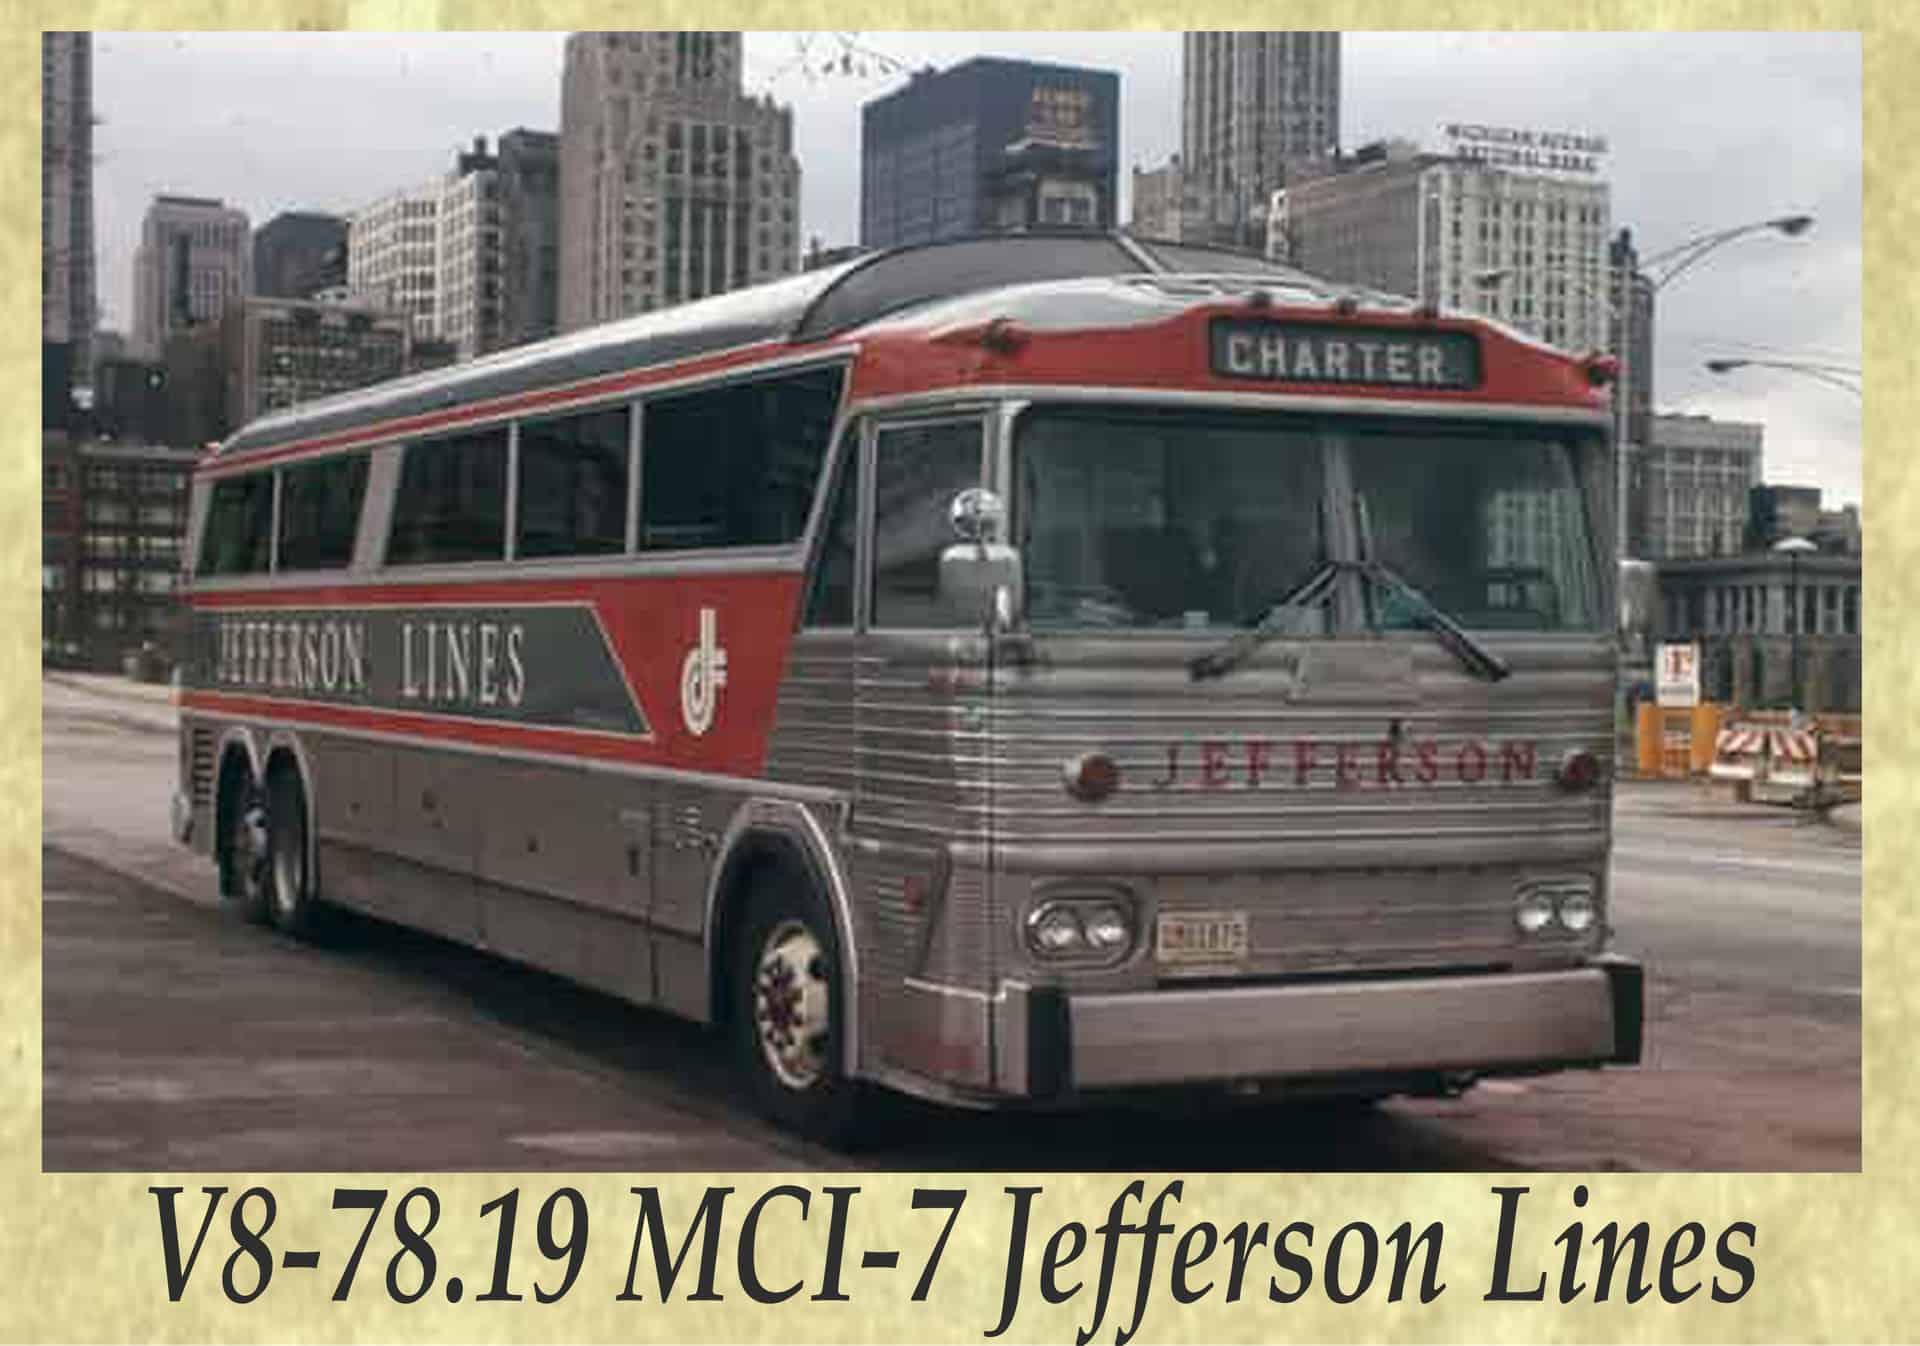 V8-78.19 MCI-7 Jefferson Lines